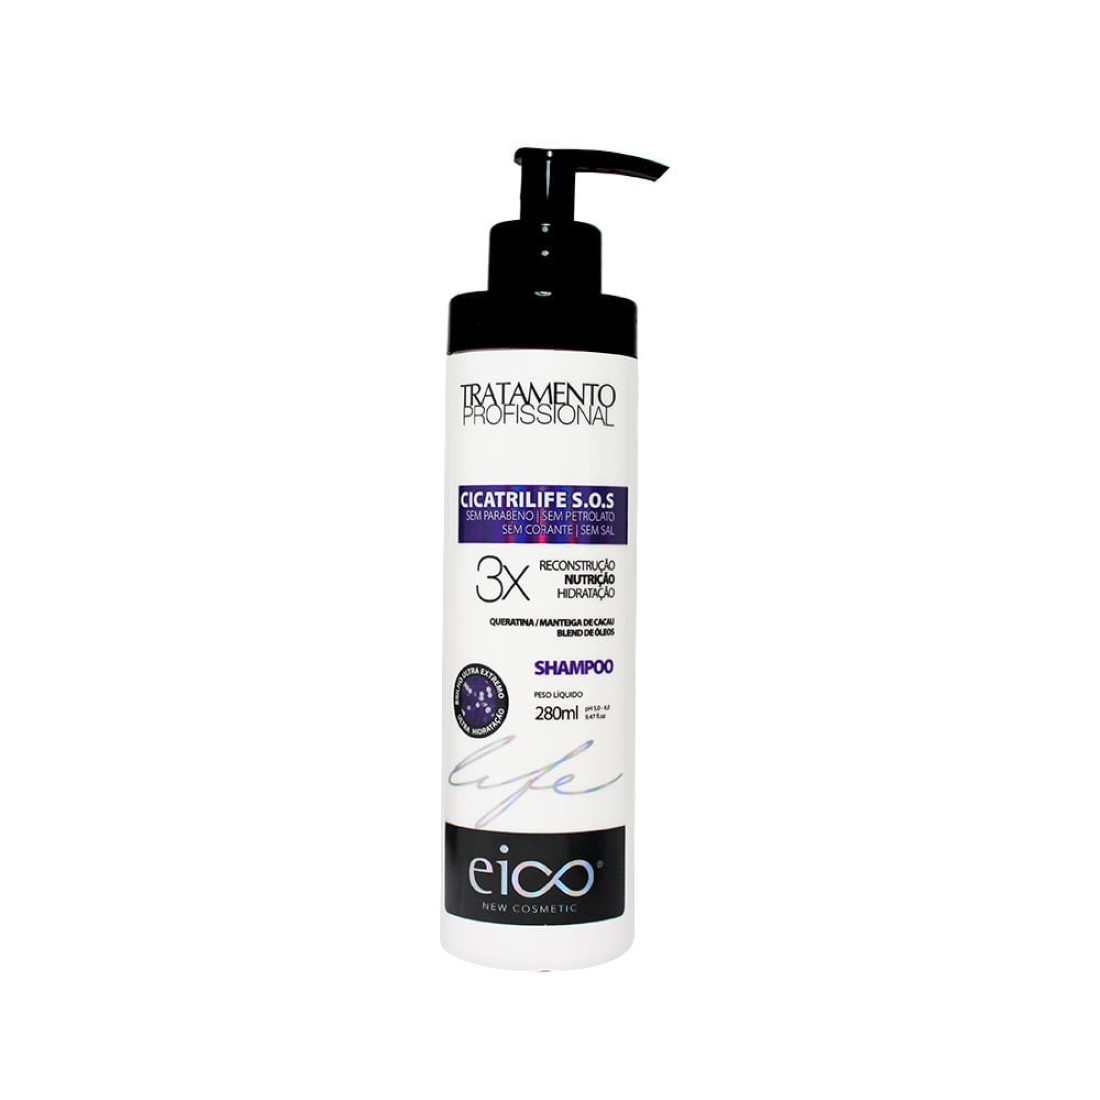 Shampoo Cicatrilife S.o.s Tratamento Profissional 280ml - Eico